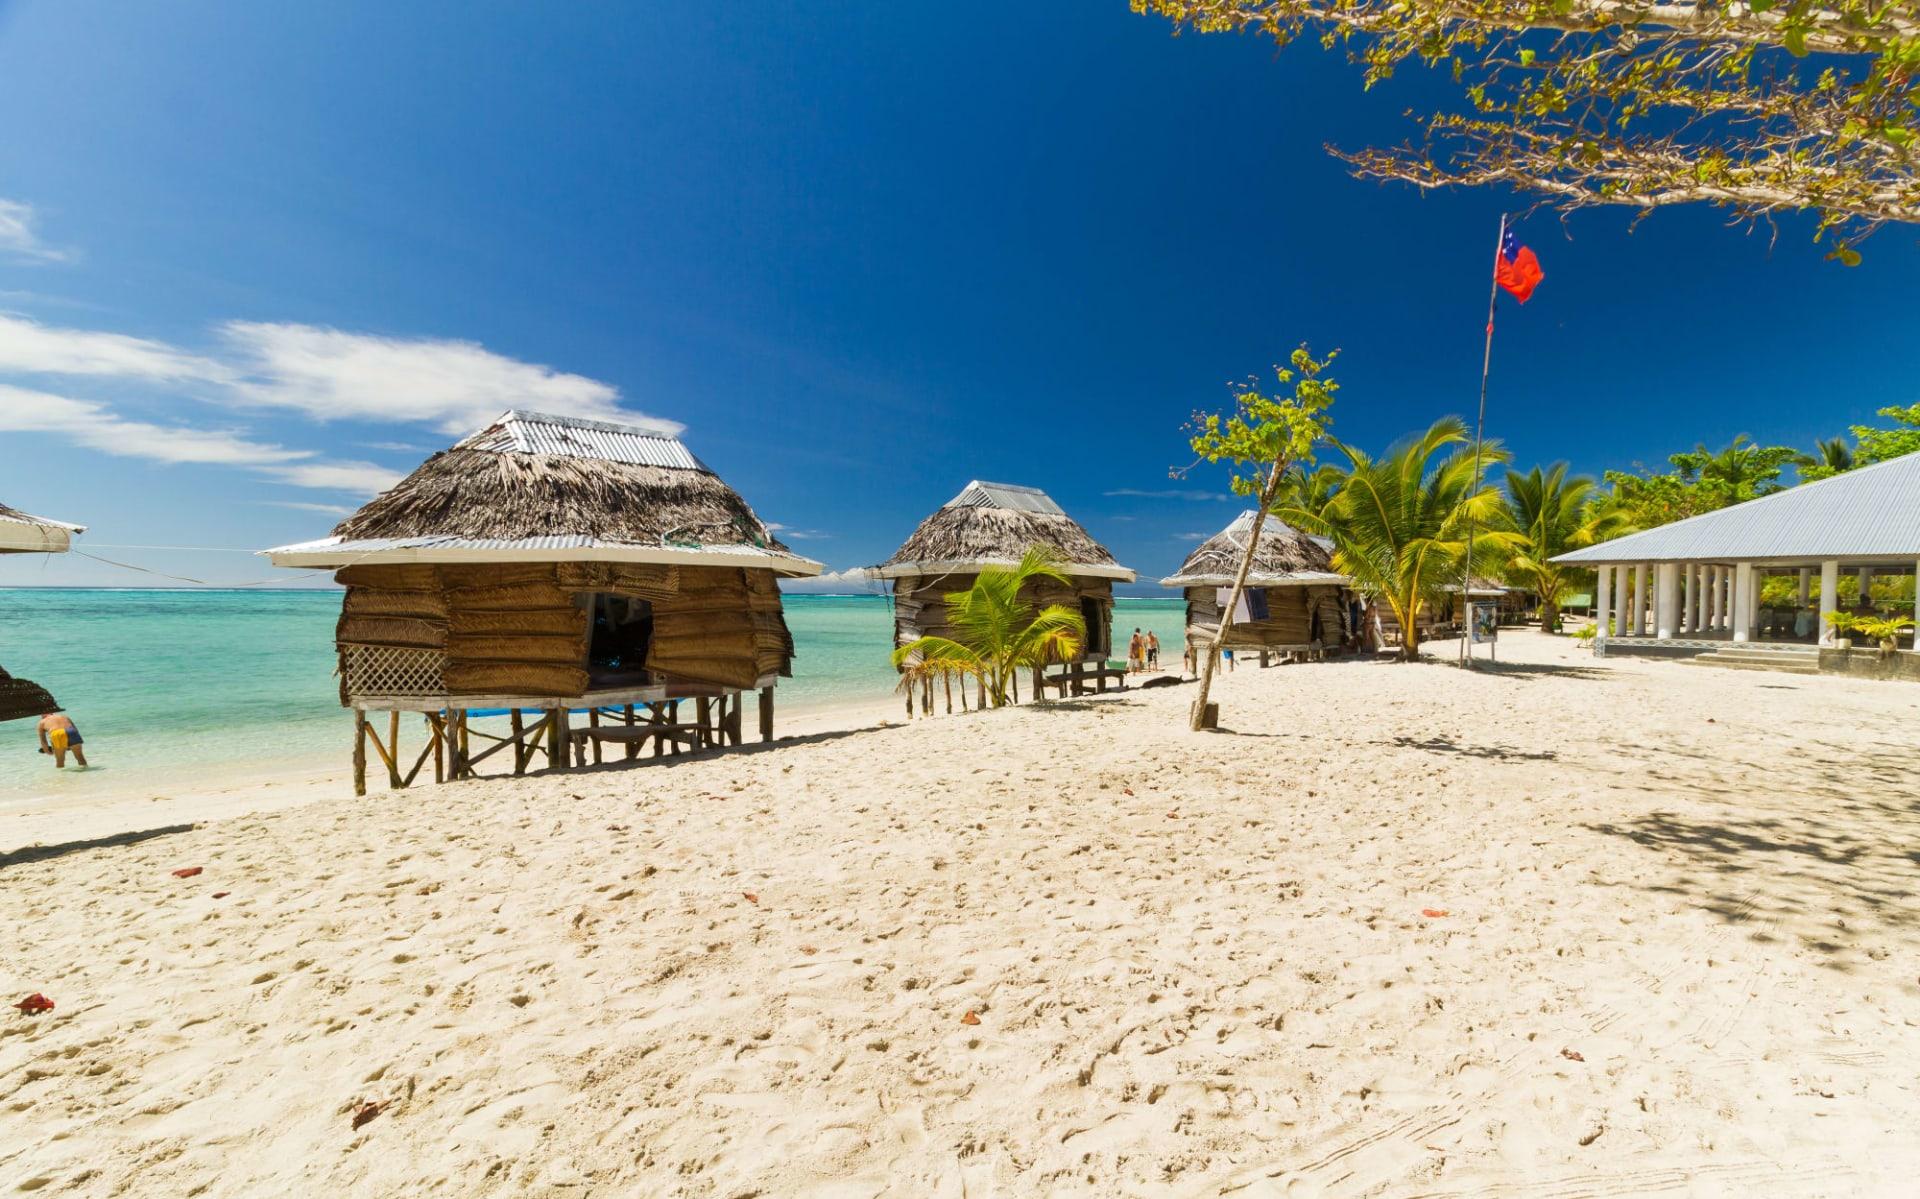 Kreuzfahrt Neuseeland, Fidschi, Samoa und Tonga ab Auckland: Südsee - Samoa Island - Strand Bungalows - Shutterstock Libor Fousek